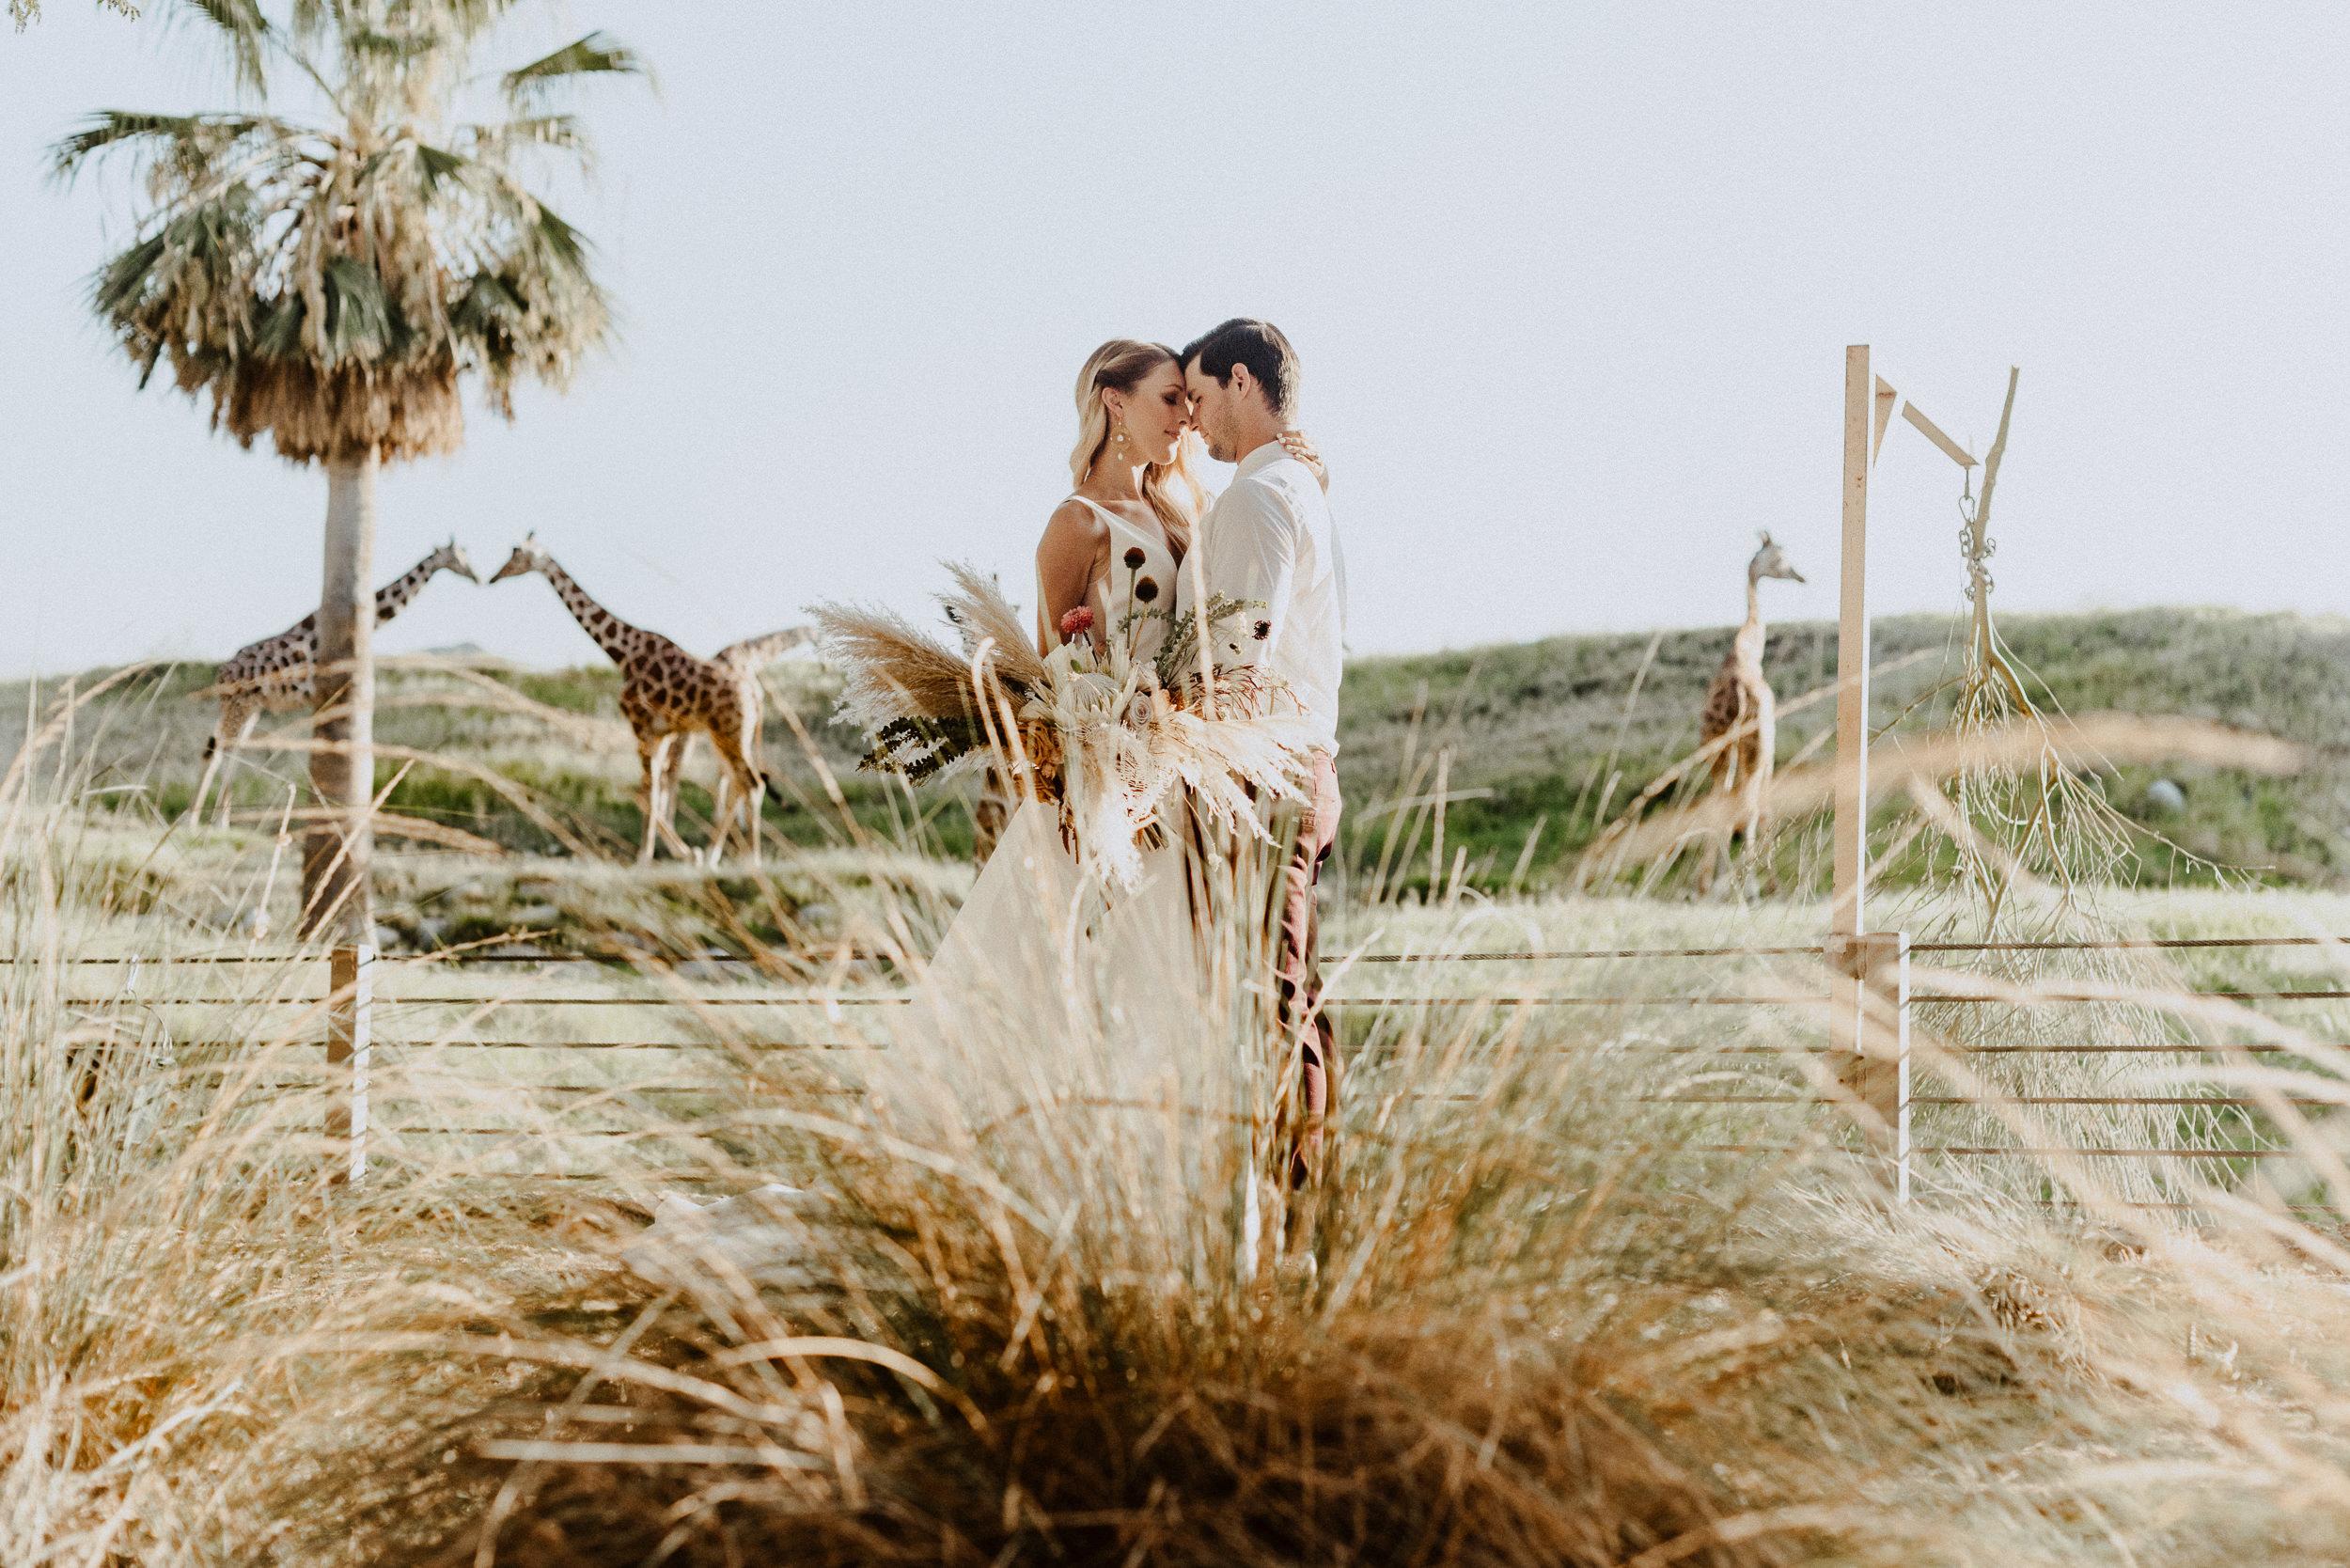 sChelsie + Chris - The Desert Shootout Wedding Romantics at The Living Desert-83.jpg